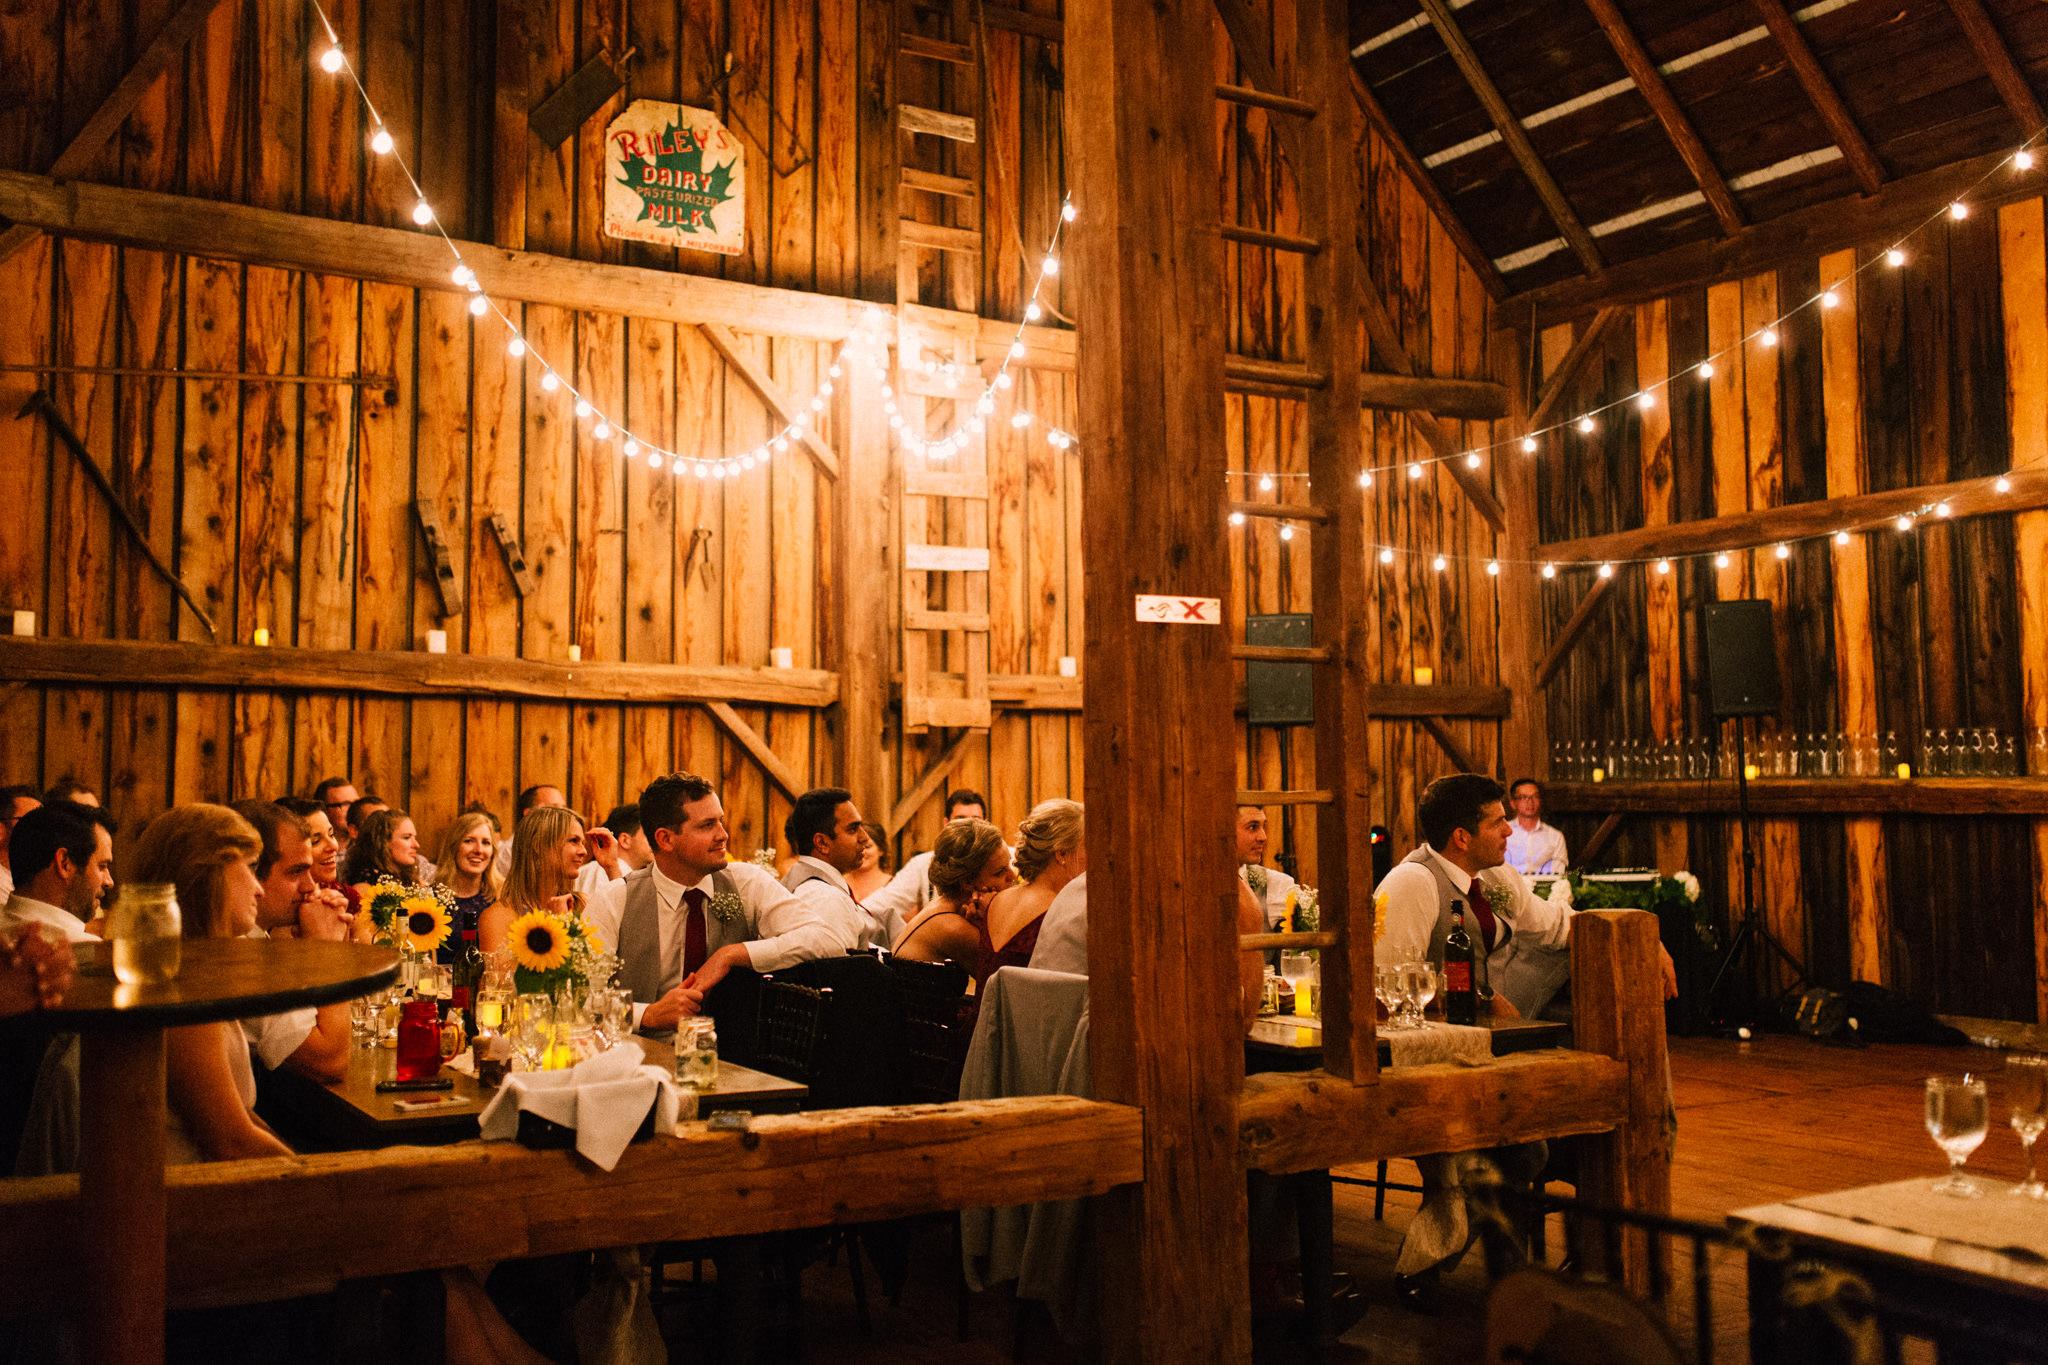 Muskoka rustic farm wedding at Brookland Farm by Max Wong Photo (68)